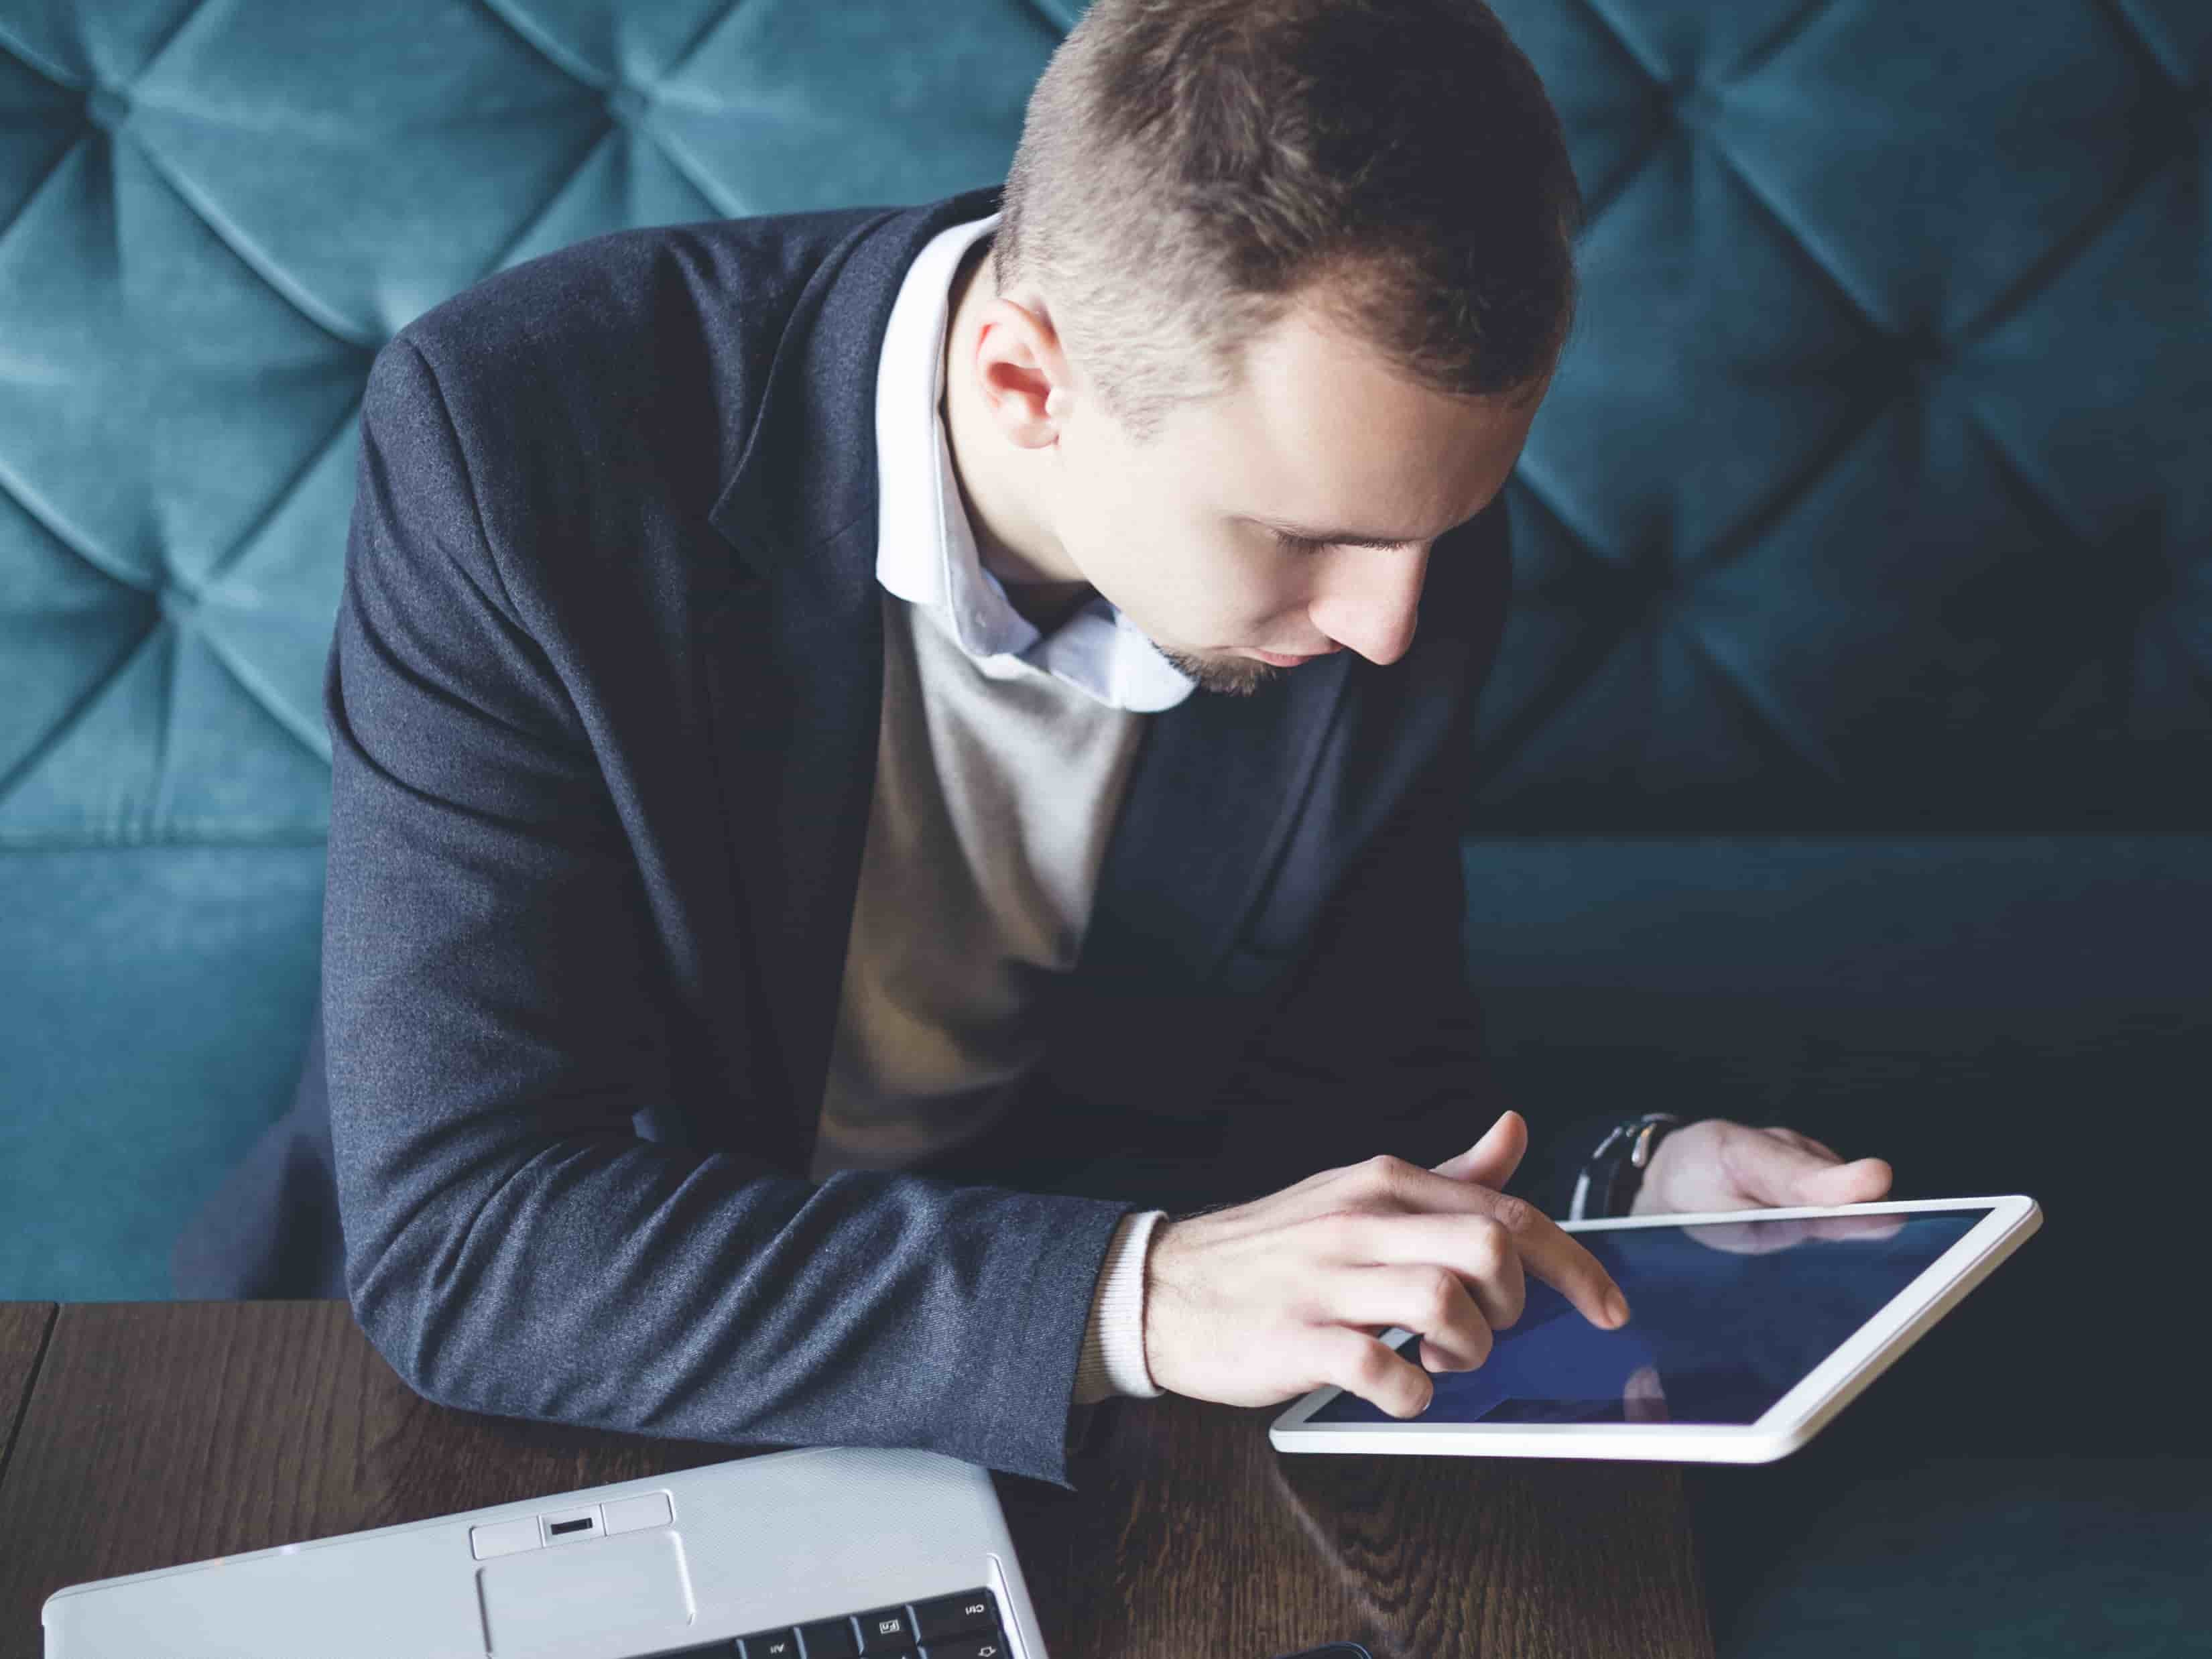 Homme en costume regarde tablette